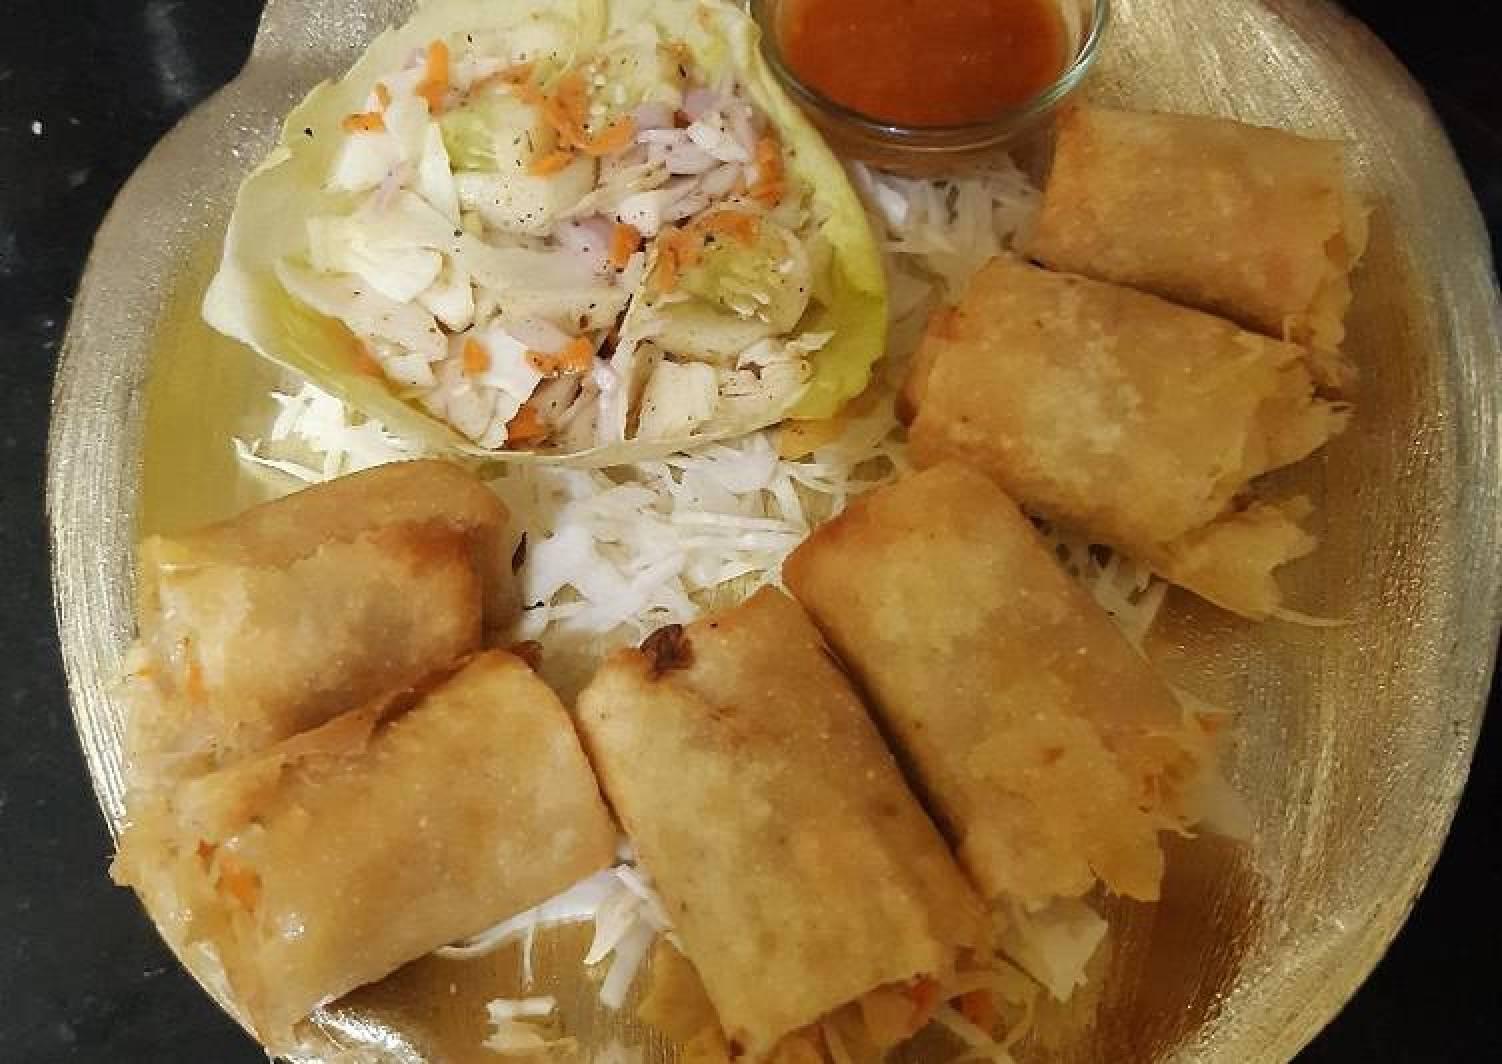 Spring rolls with kimchi salad and schezwan sauce dip